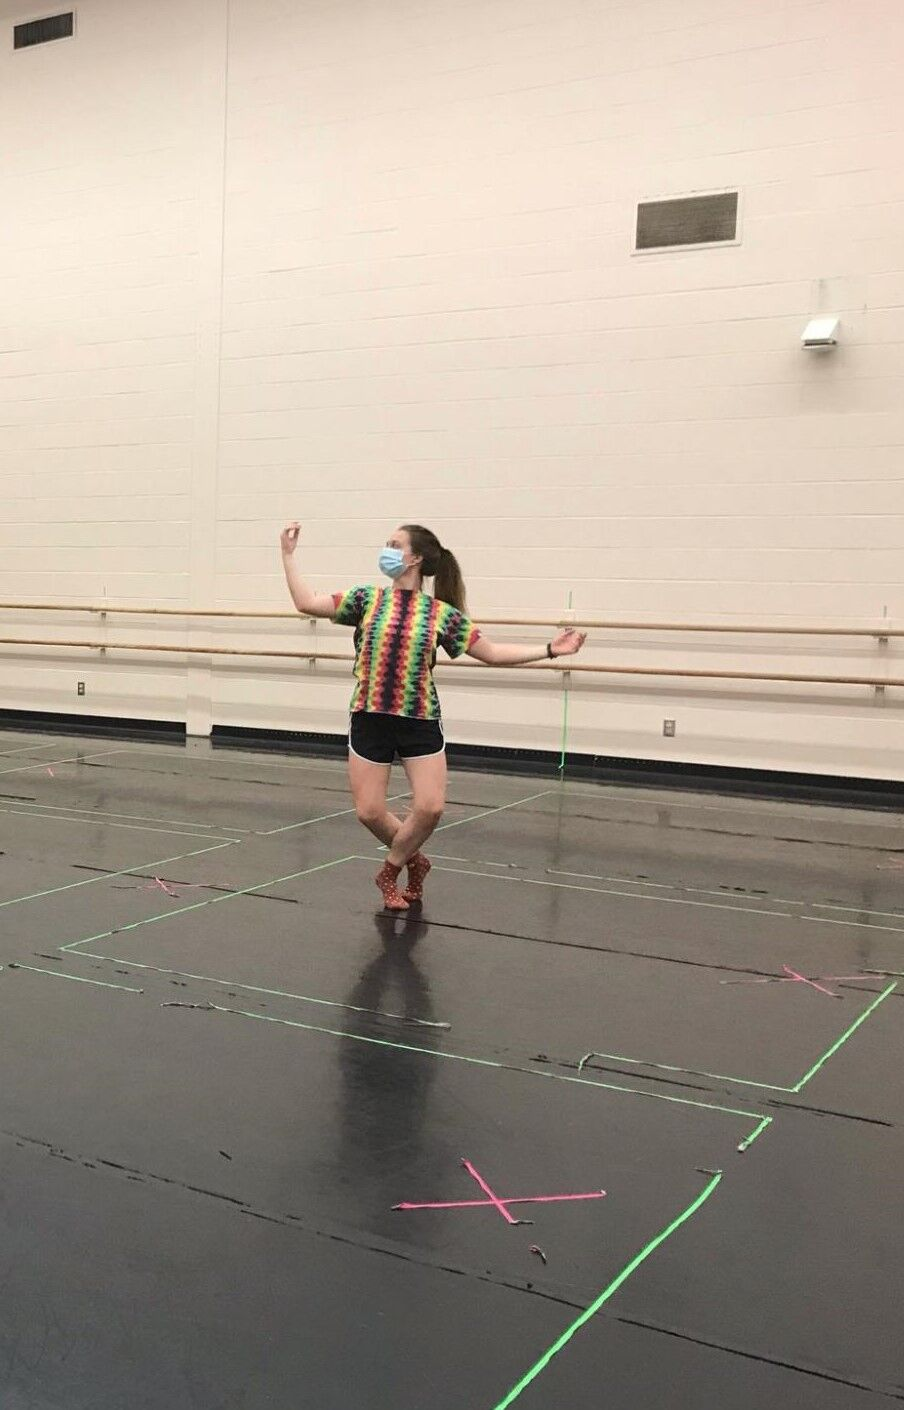 Theatre performance dance practice